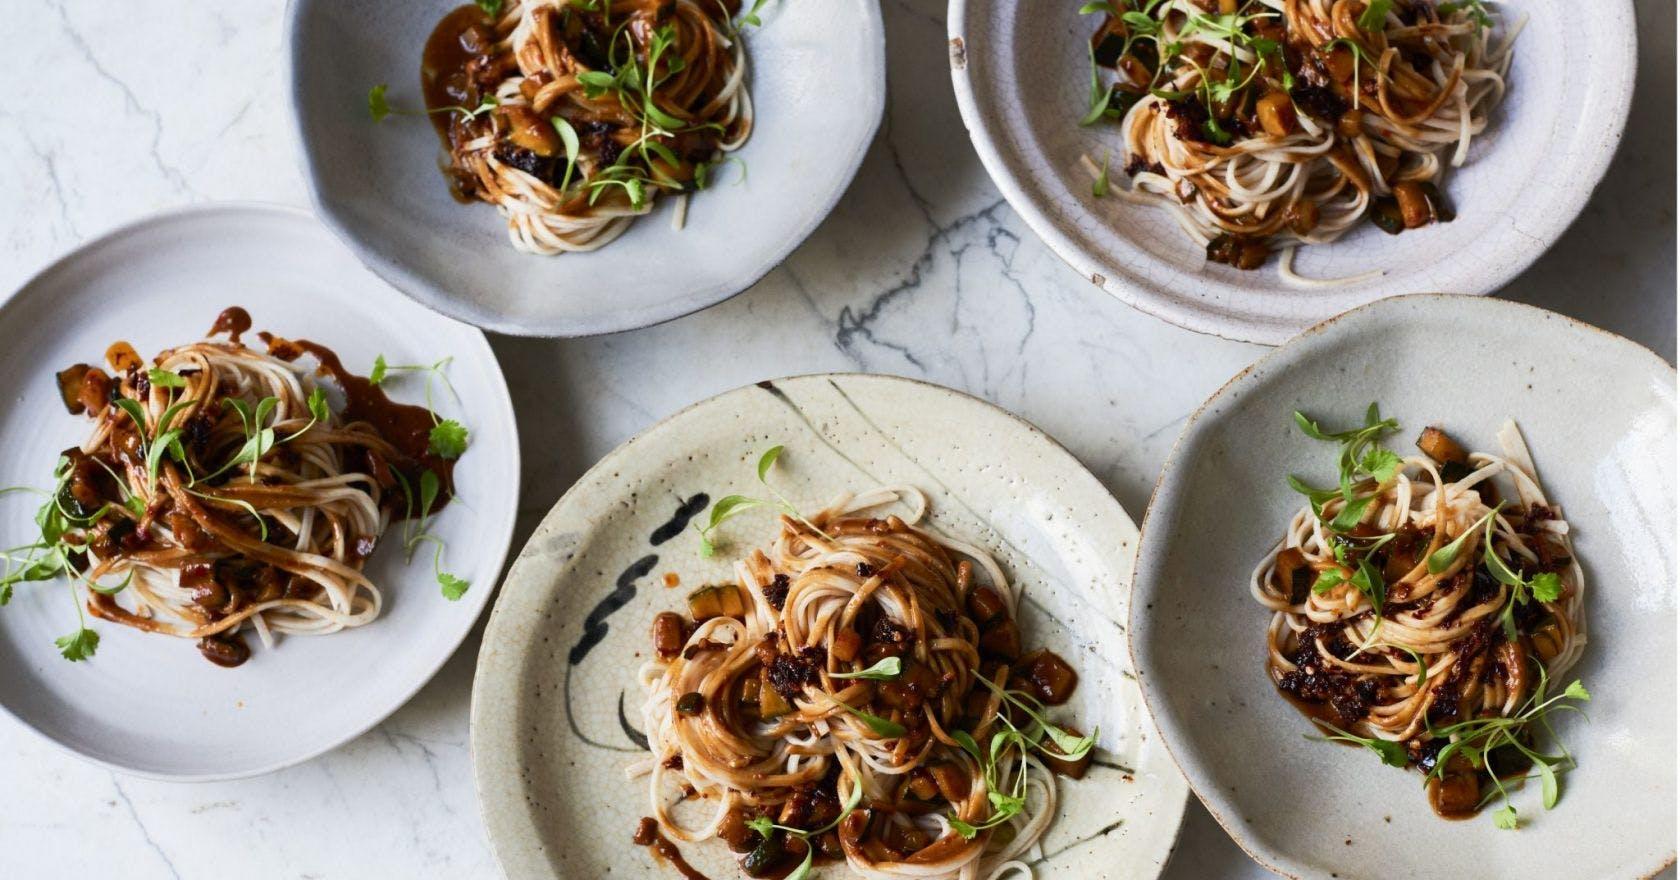 Healthy Vegan Recipes Spicy Sichuan Dan Dan Noodles Best Chinese Recipes